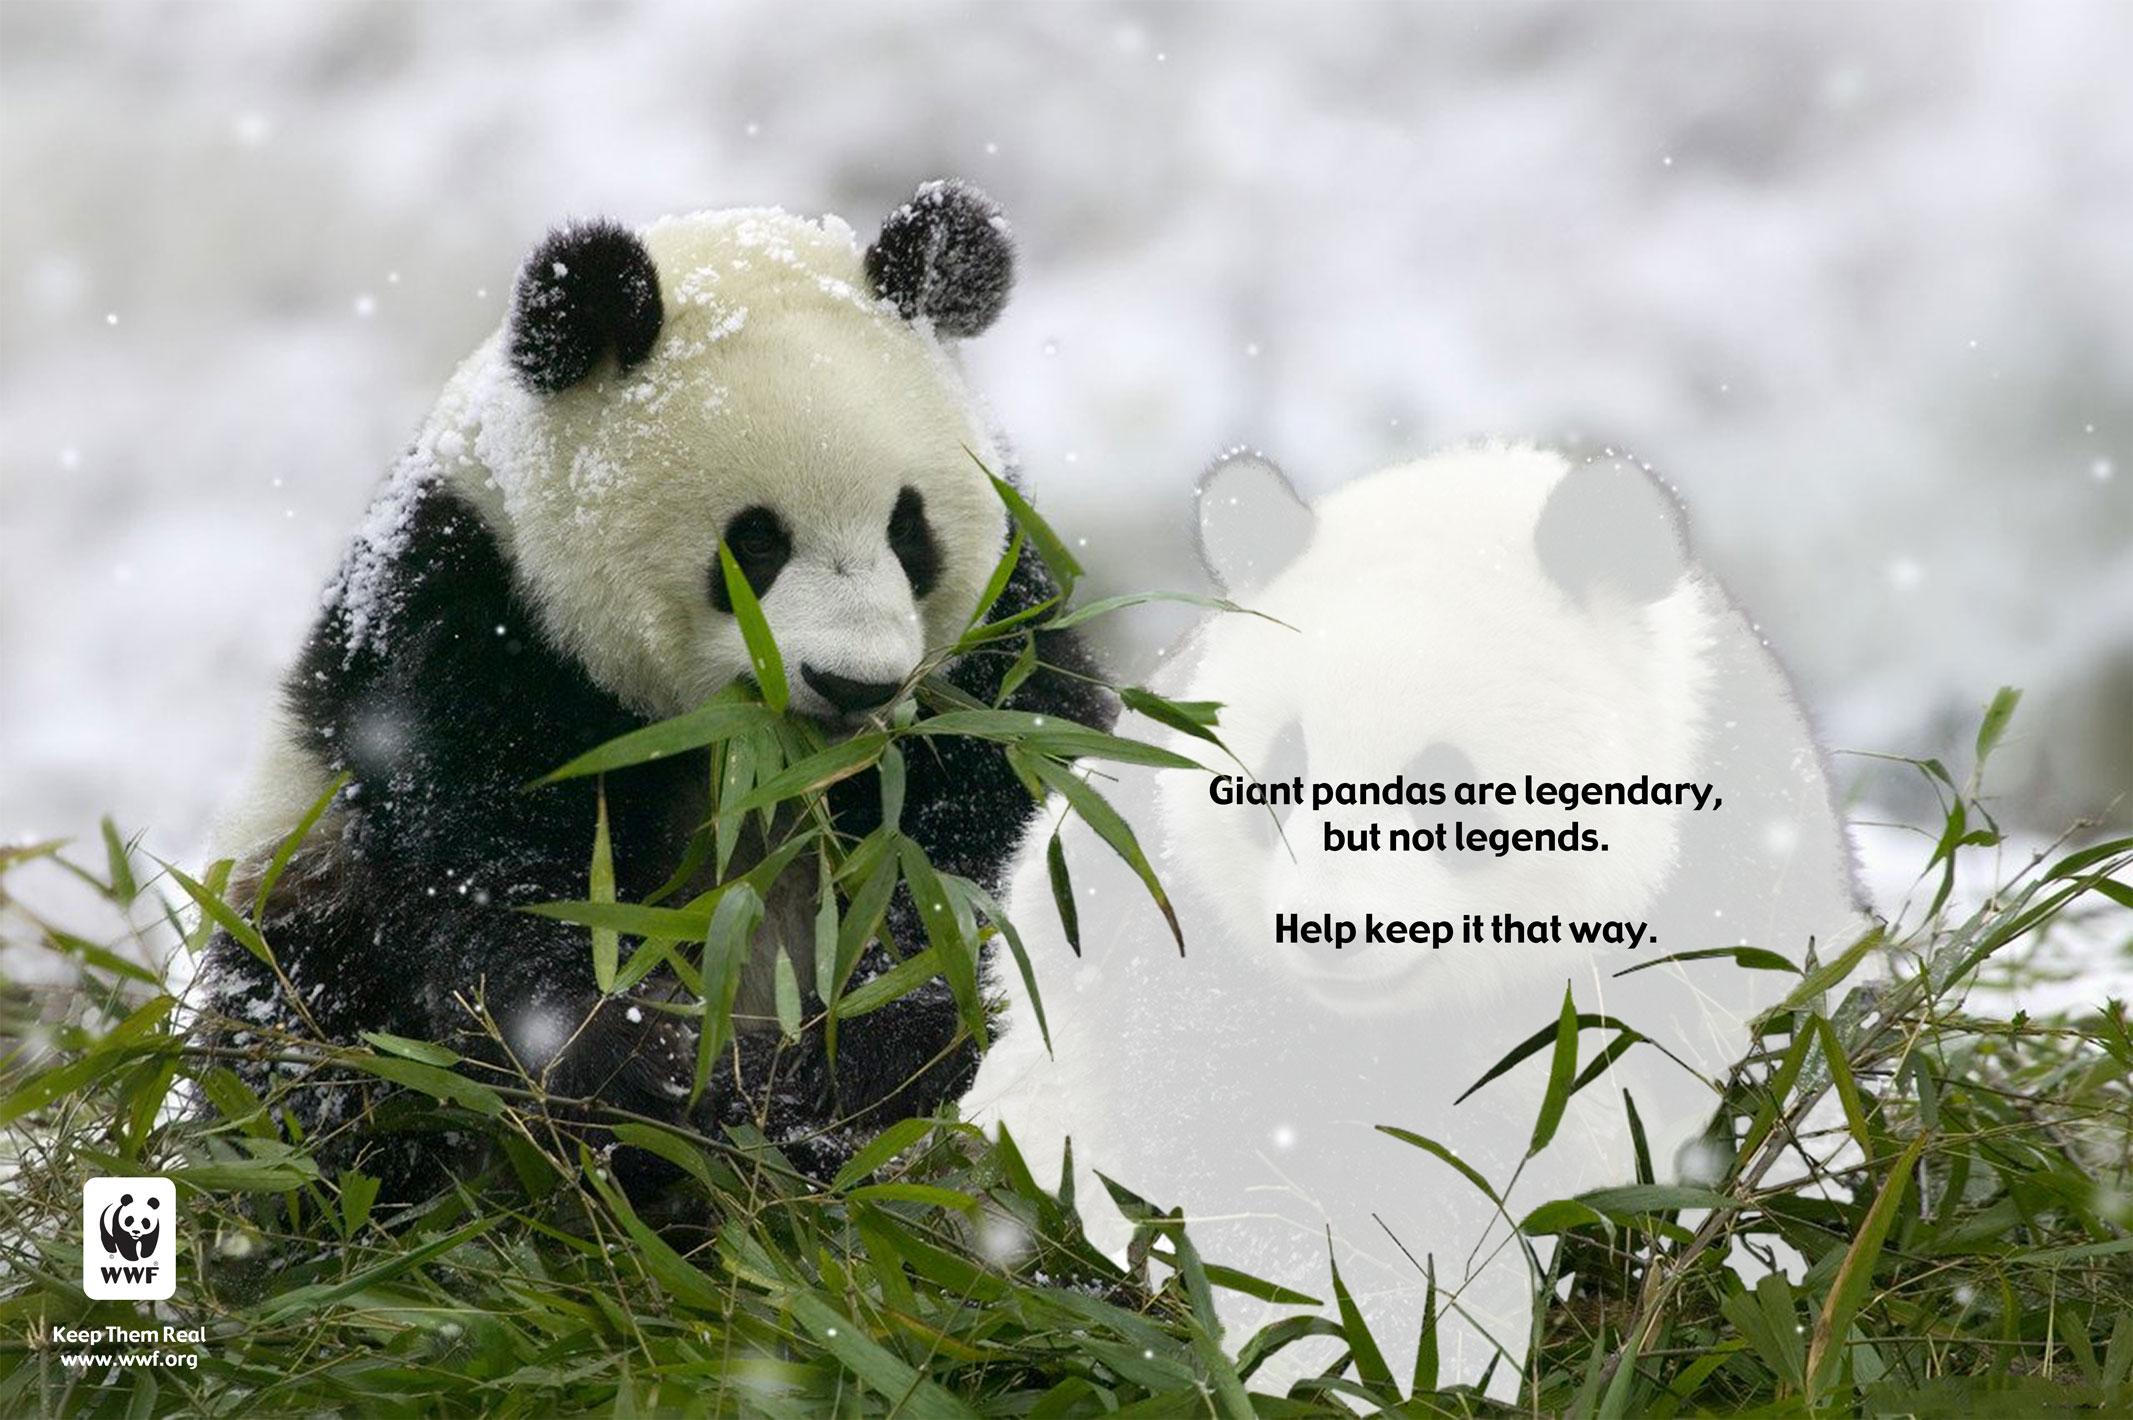 Panda_Removed.jpg